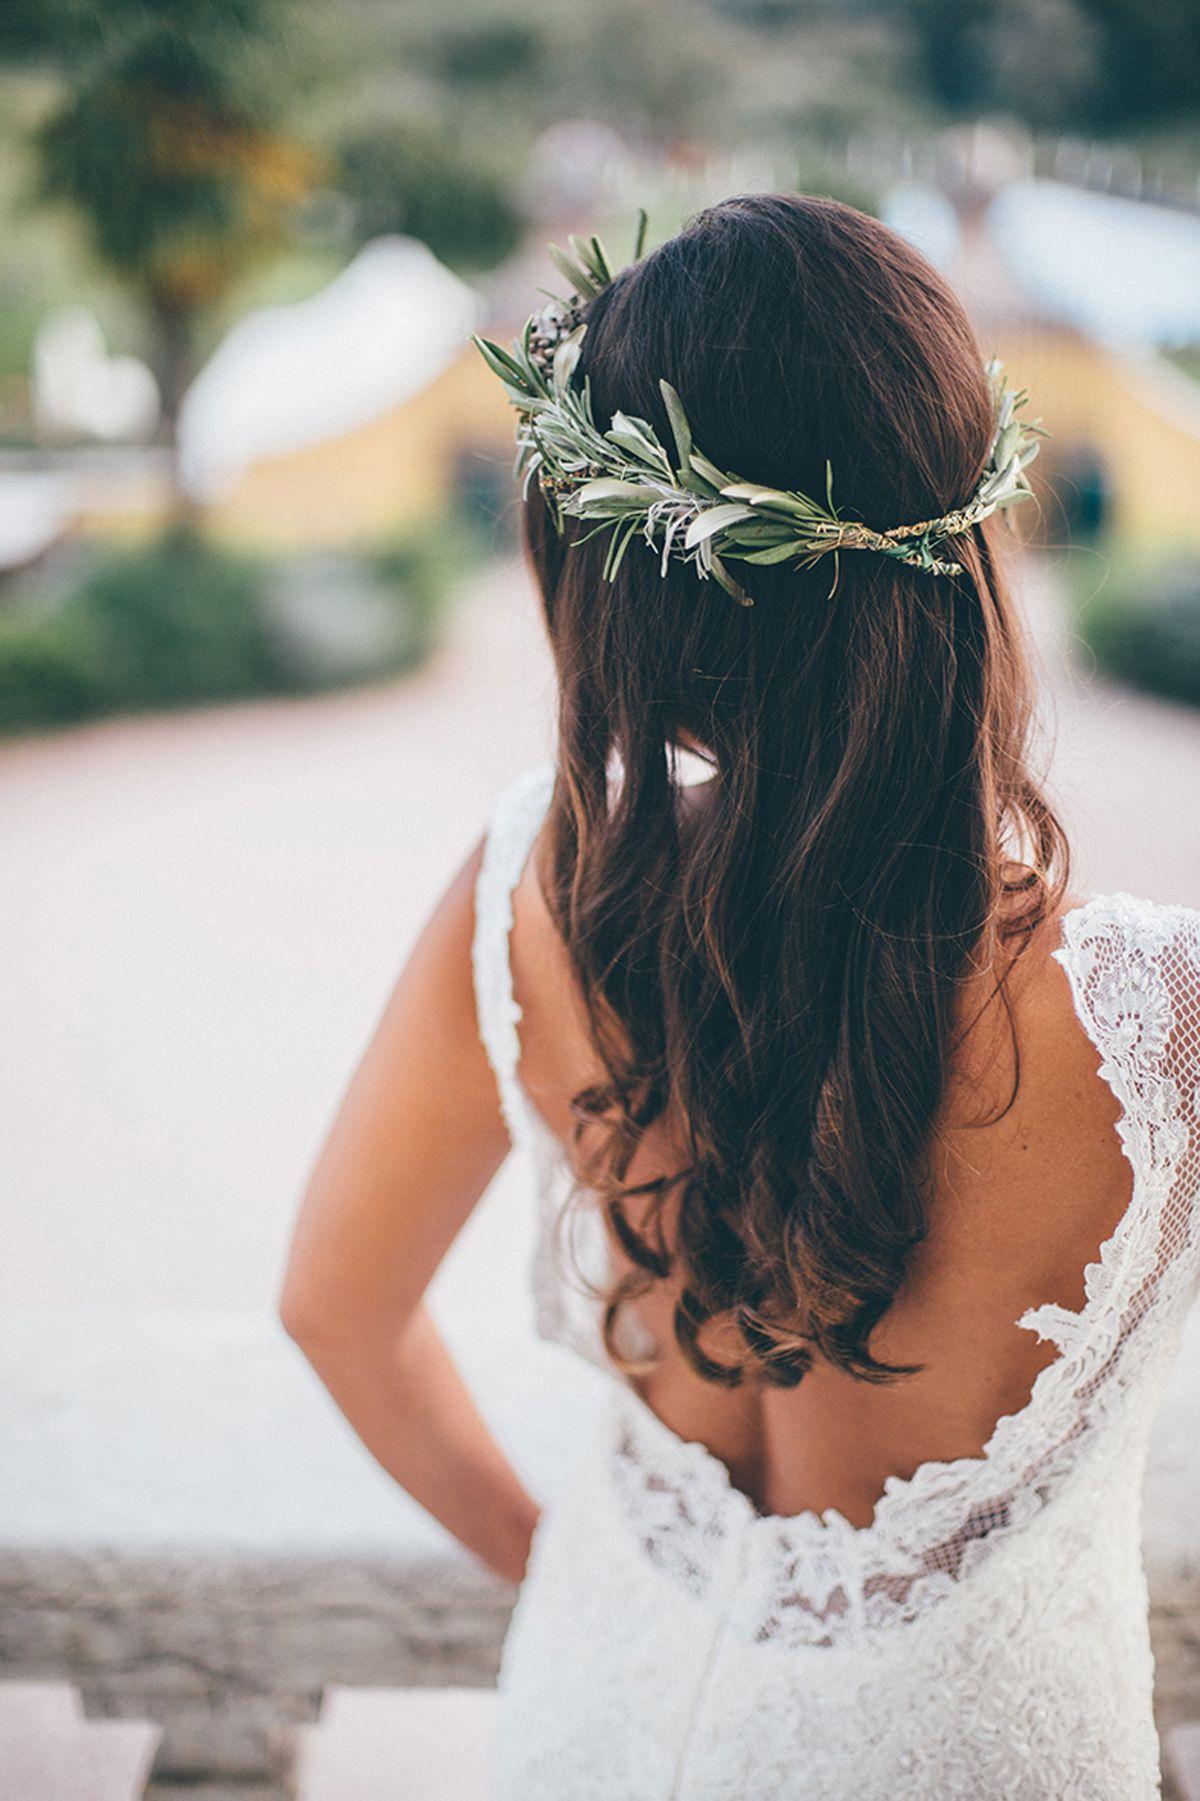 Mediterran Heiraten In Italien Haarkranz Hochzeit Haare Hochzeit Heiraten In Italien